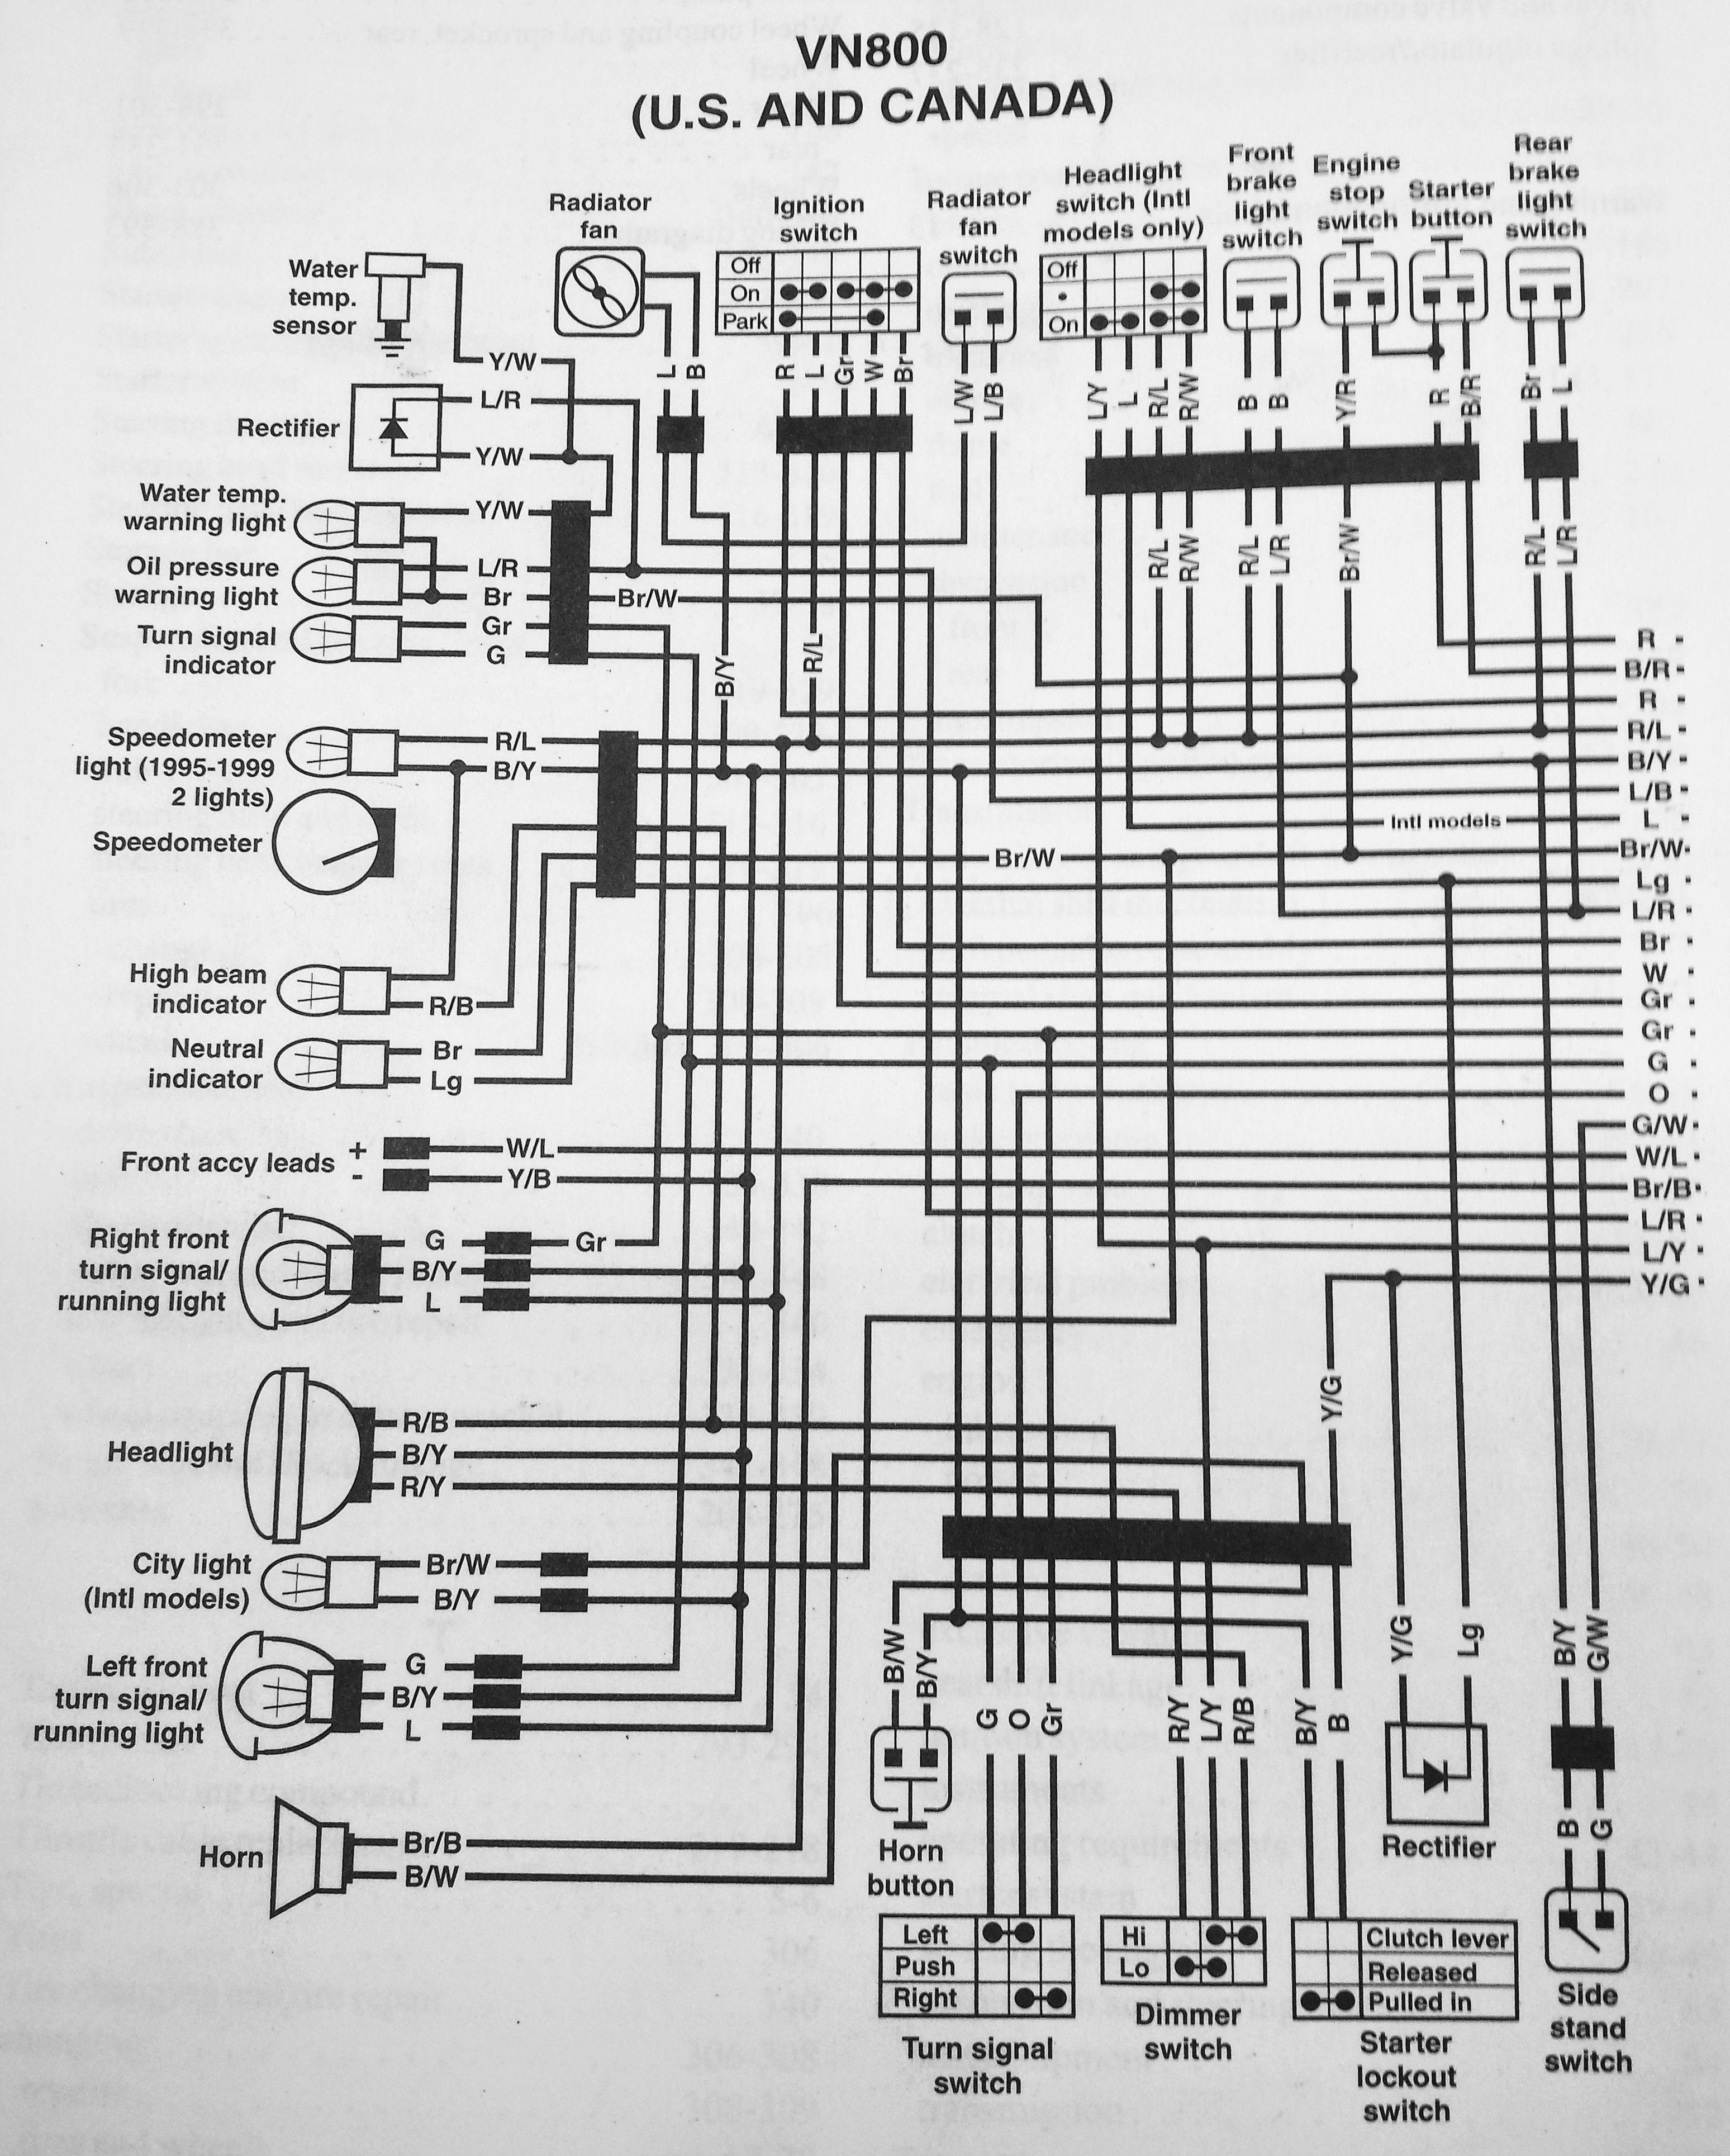 triumph t100 wiring diagram cause and effect word fuse box kawasaki vulcan 900 blog custom data today 2009 classic